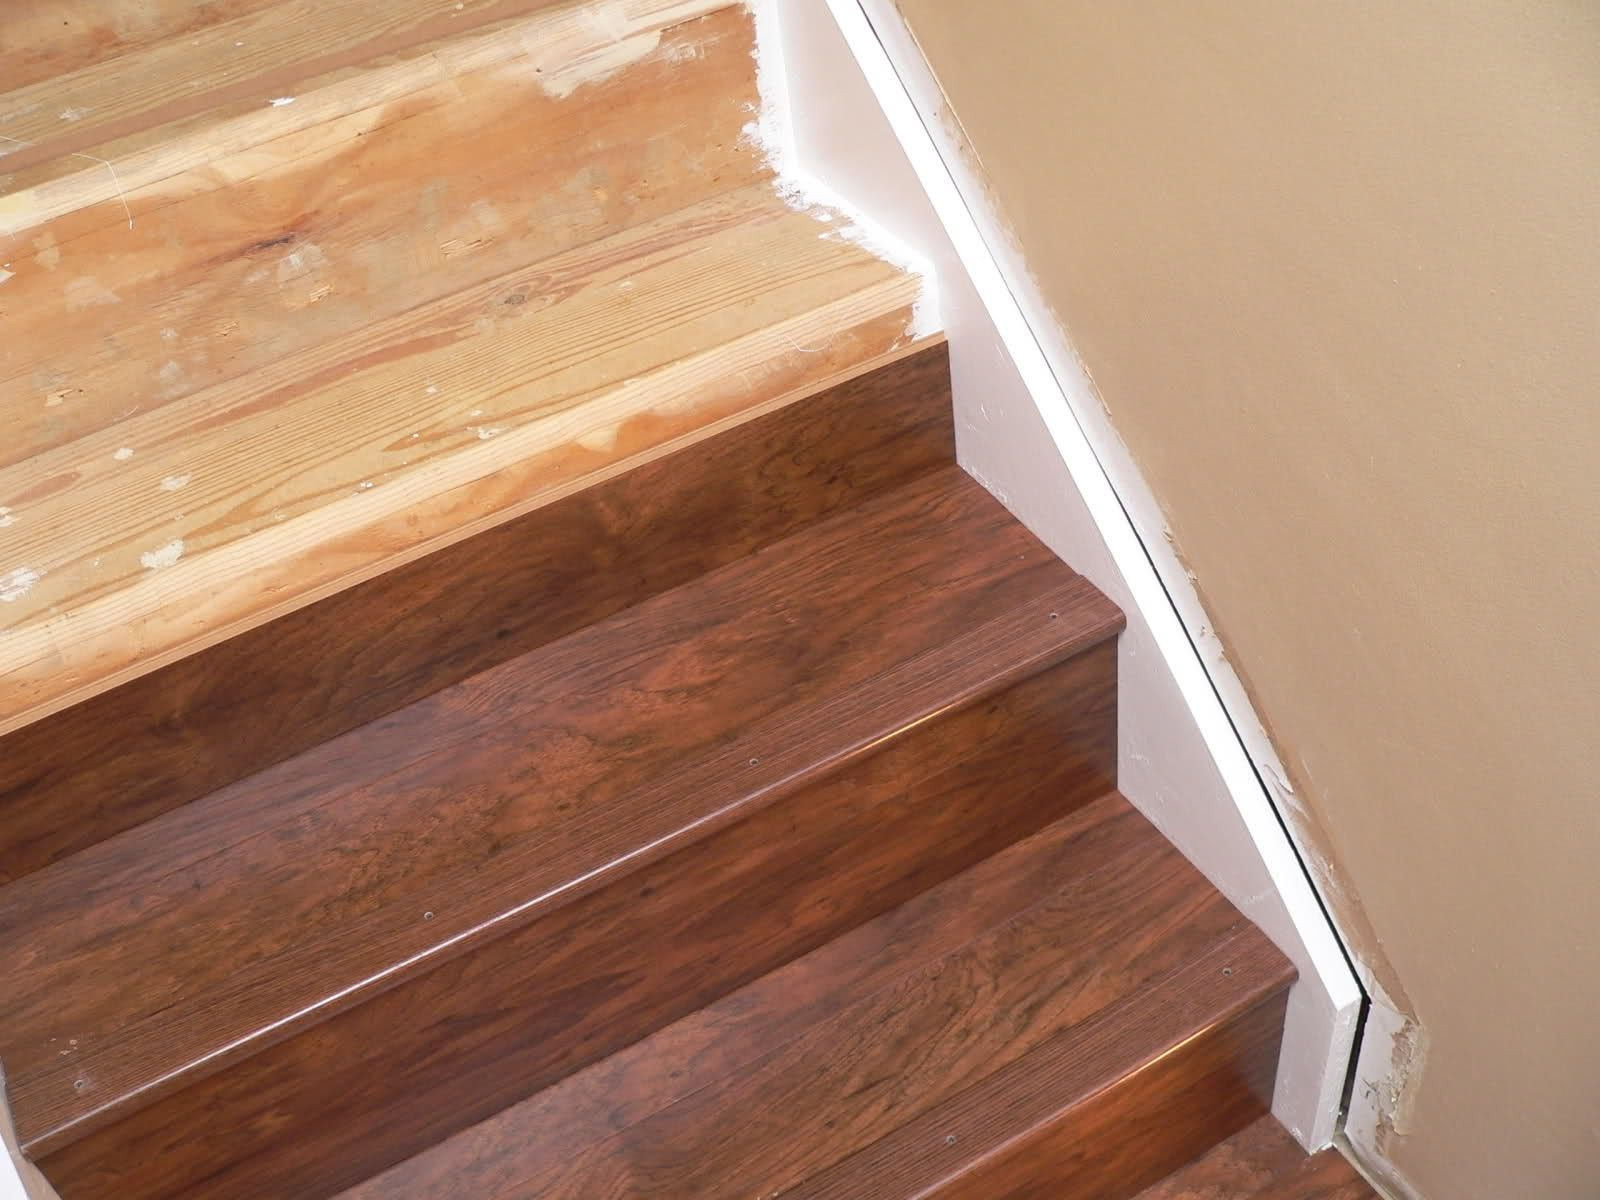 Flooring On Stairs Pergo Laminate Flooring On Flooring For Stairs Pergo Laminate Flooring Wood Floors Wide Plank